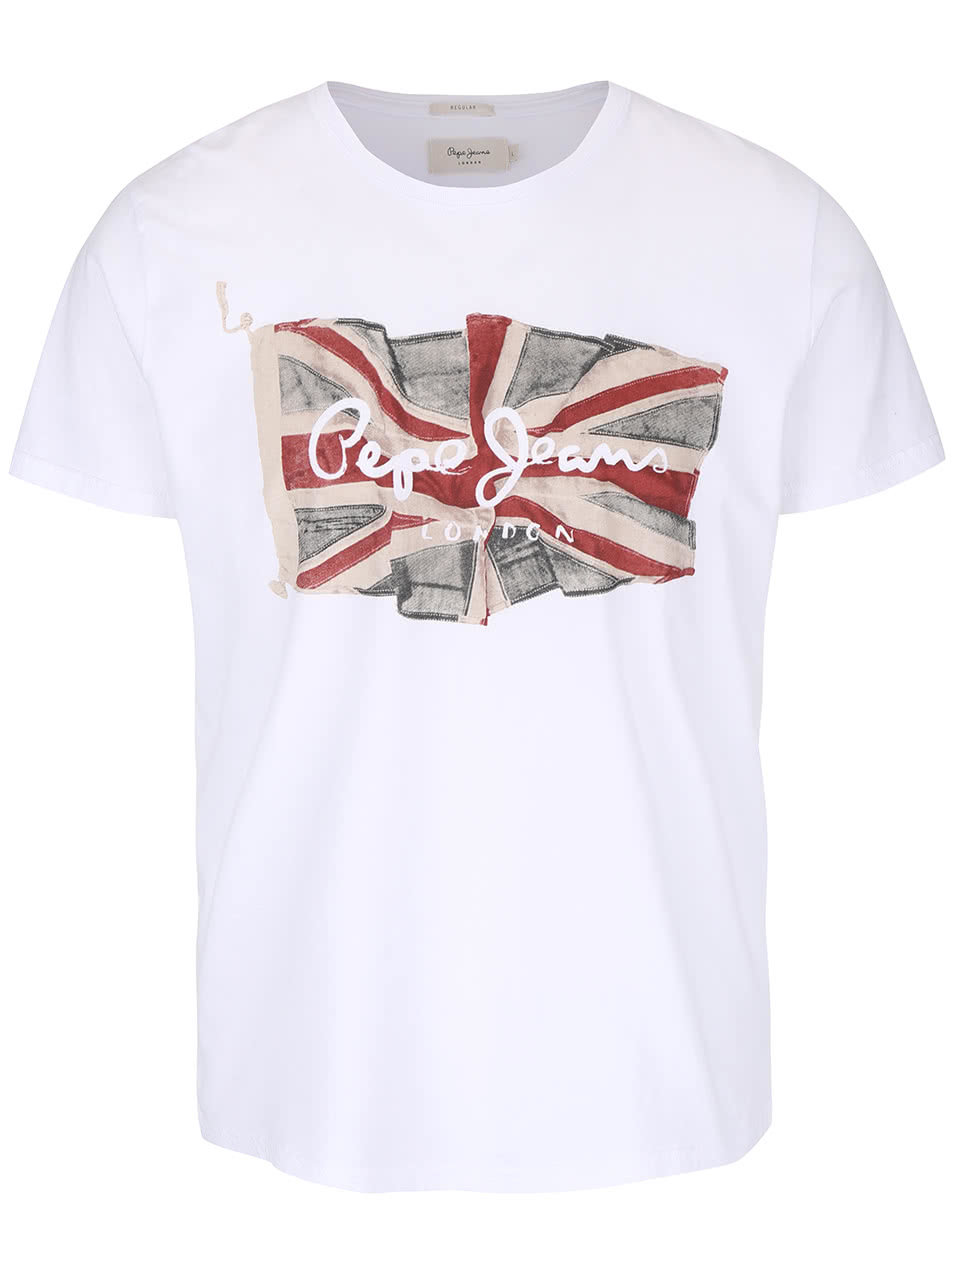 d5d7f9074a4 Bílé pánské triko s potiskem Pepe Jeans Flag logo ...